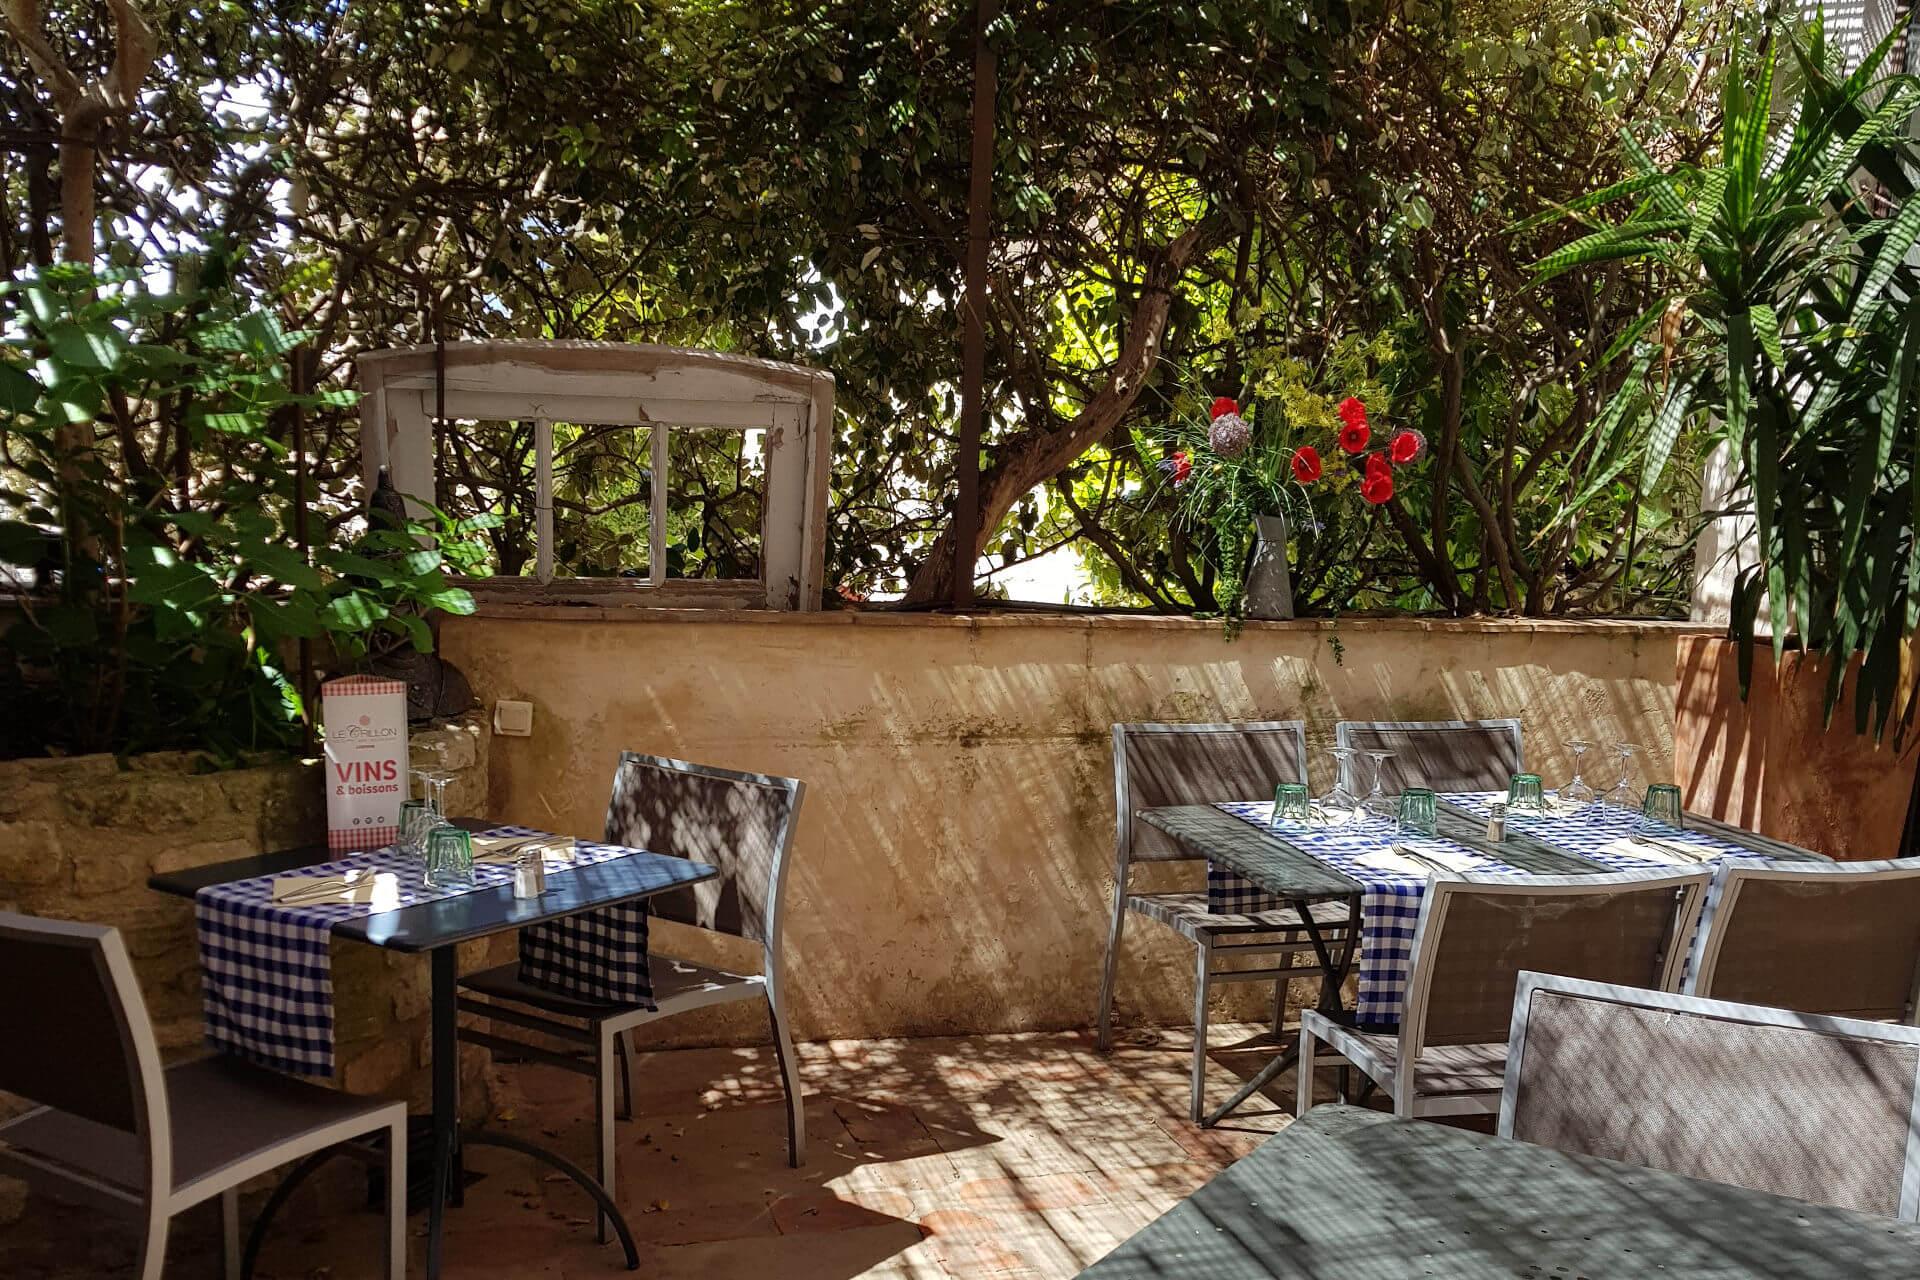 terrasse restaurant murs